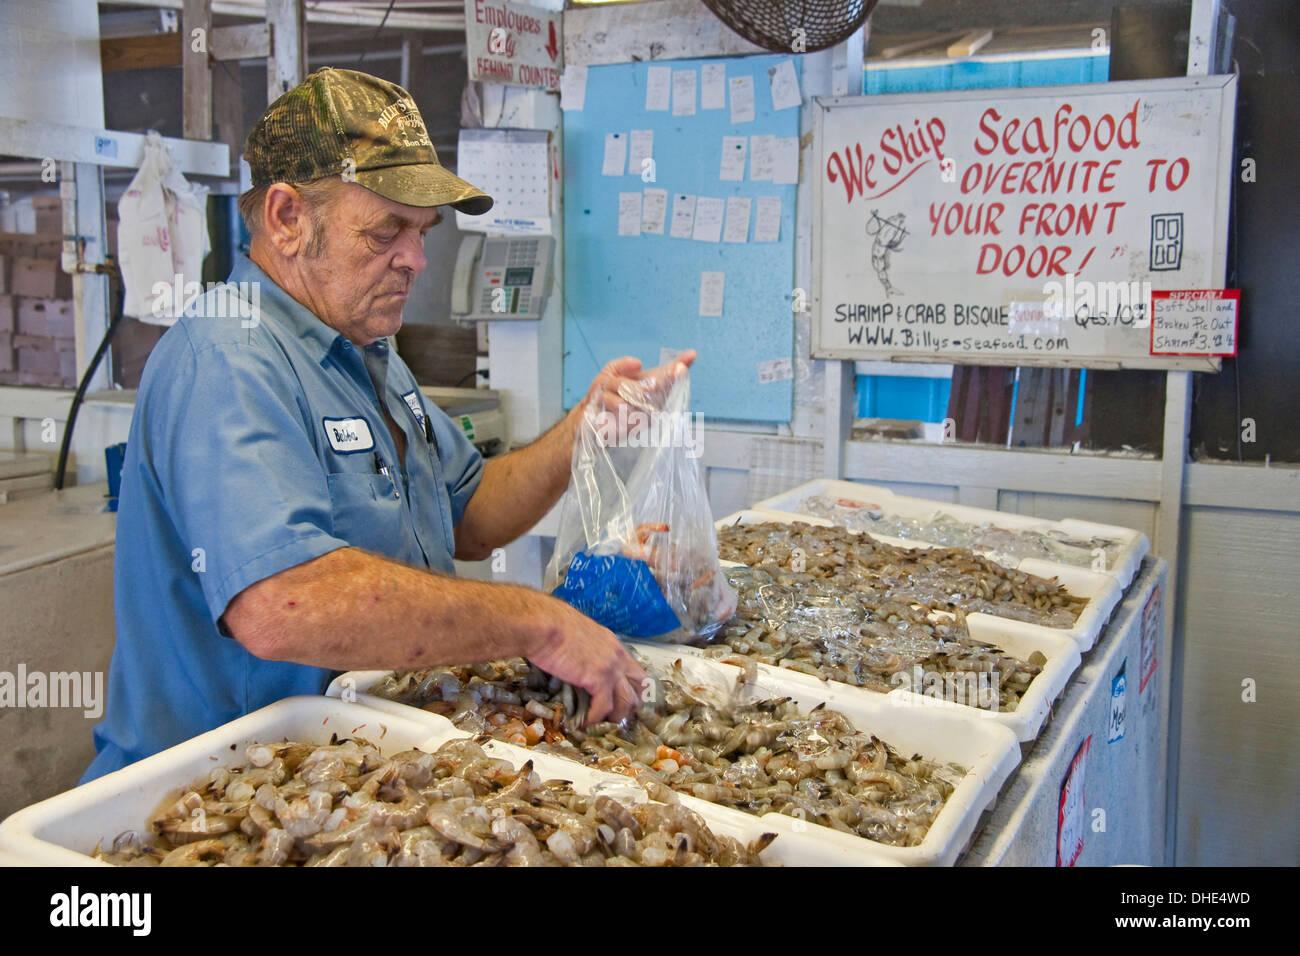 Billy's Seafood on Alabama Gulf Coast. - Stock Image